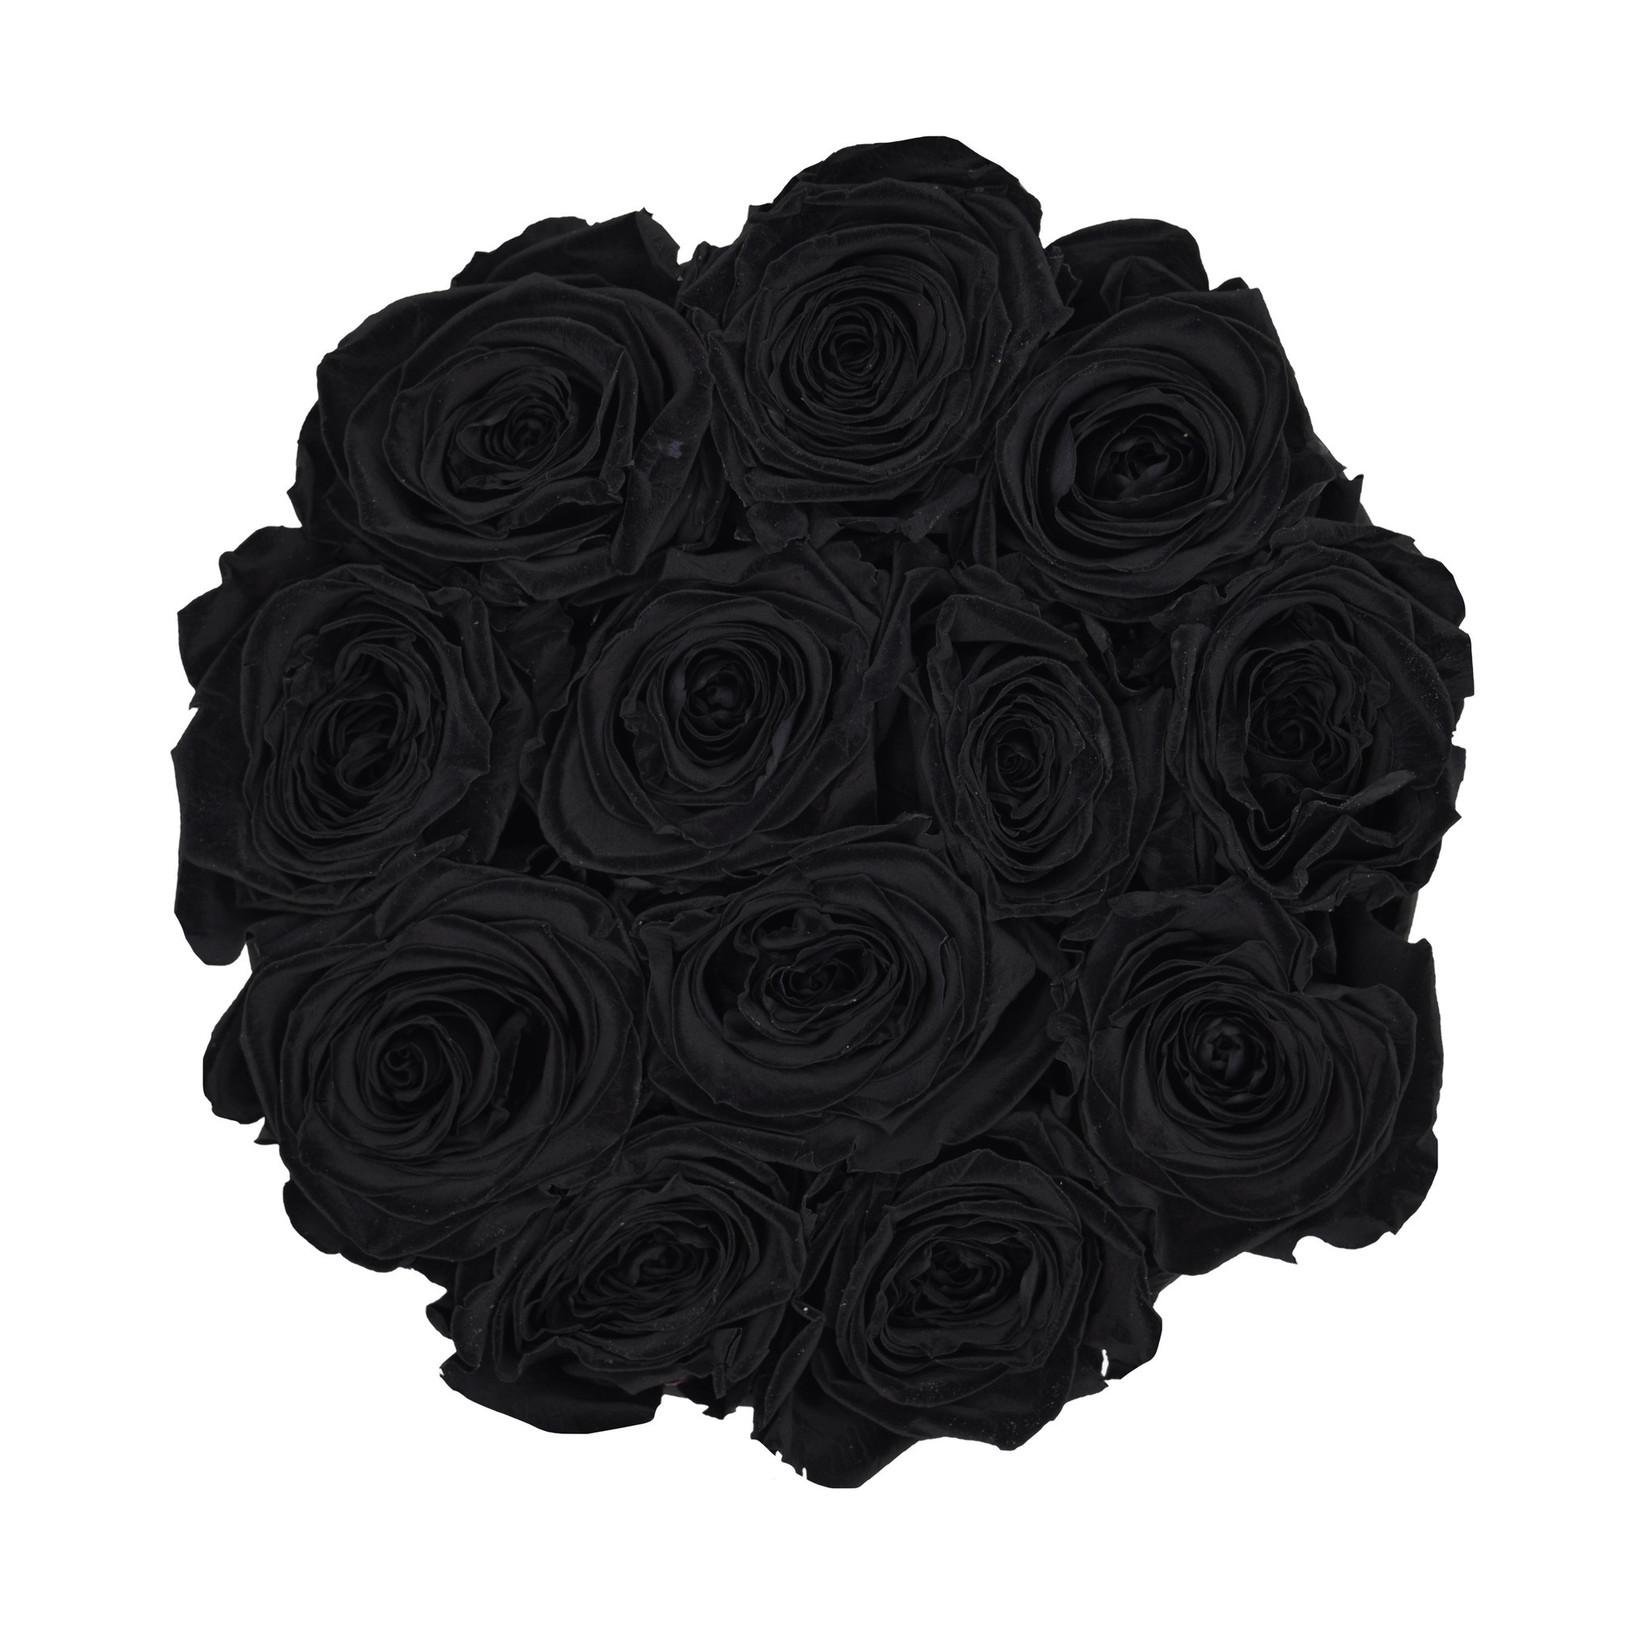 Small - Black Endless Roses - White Box